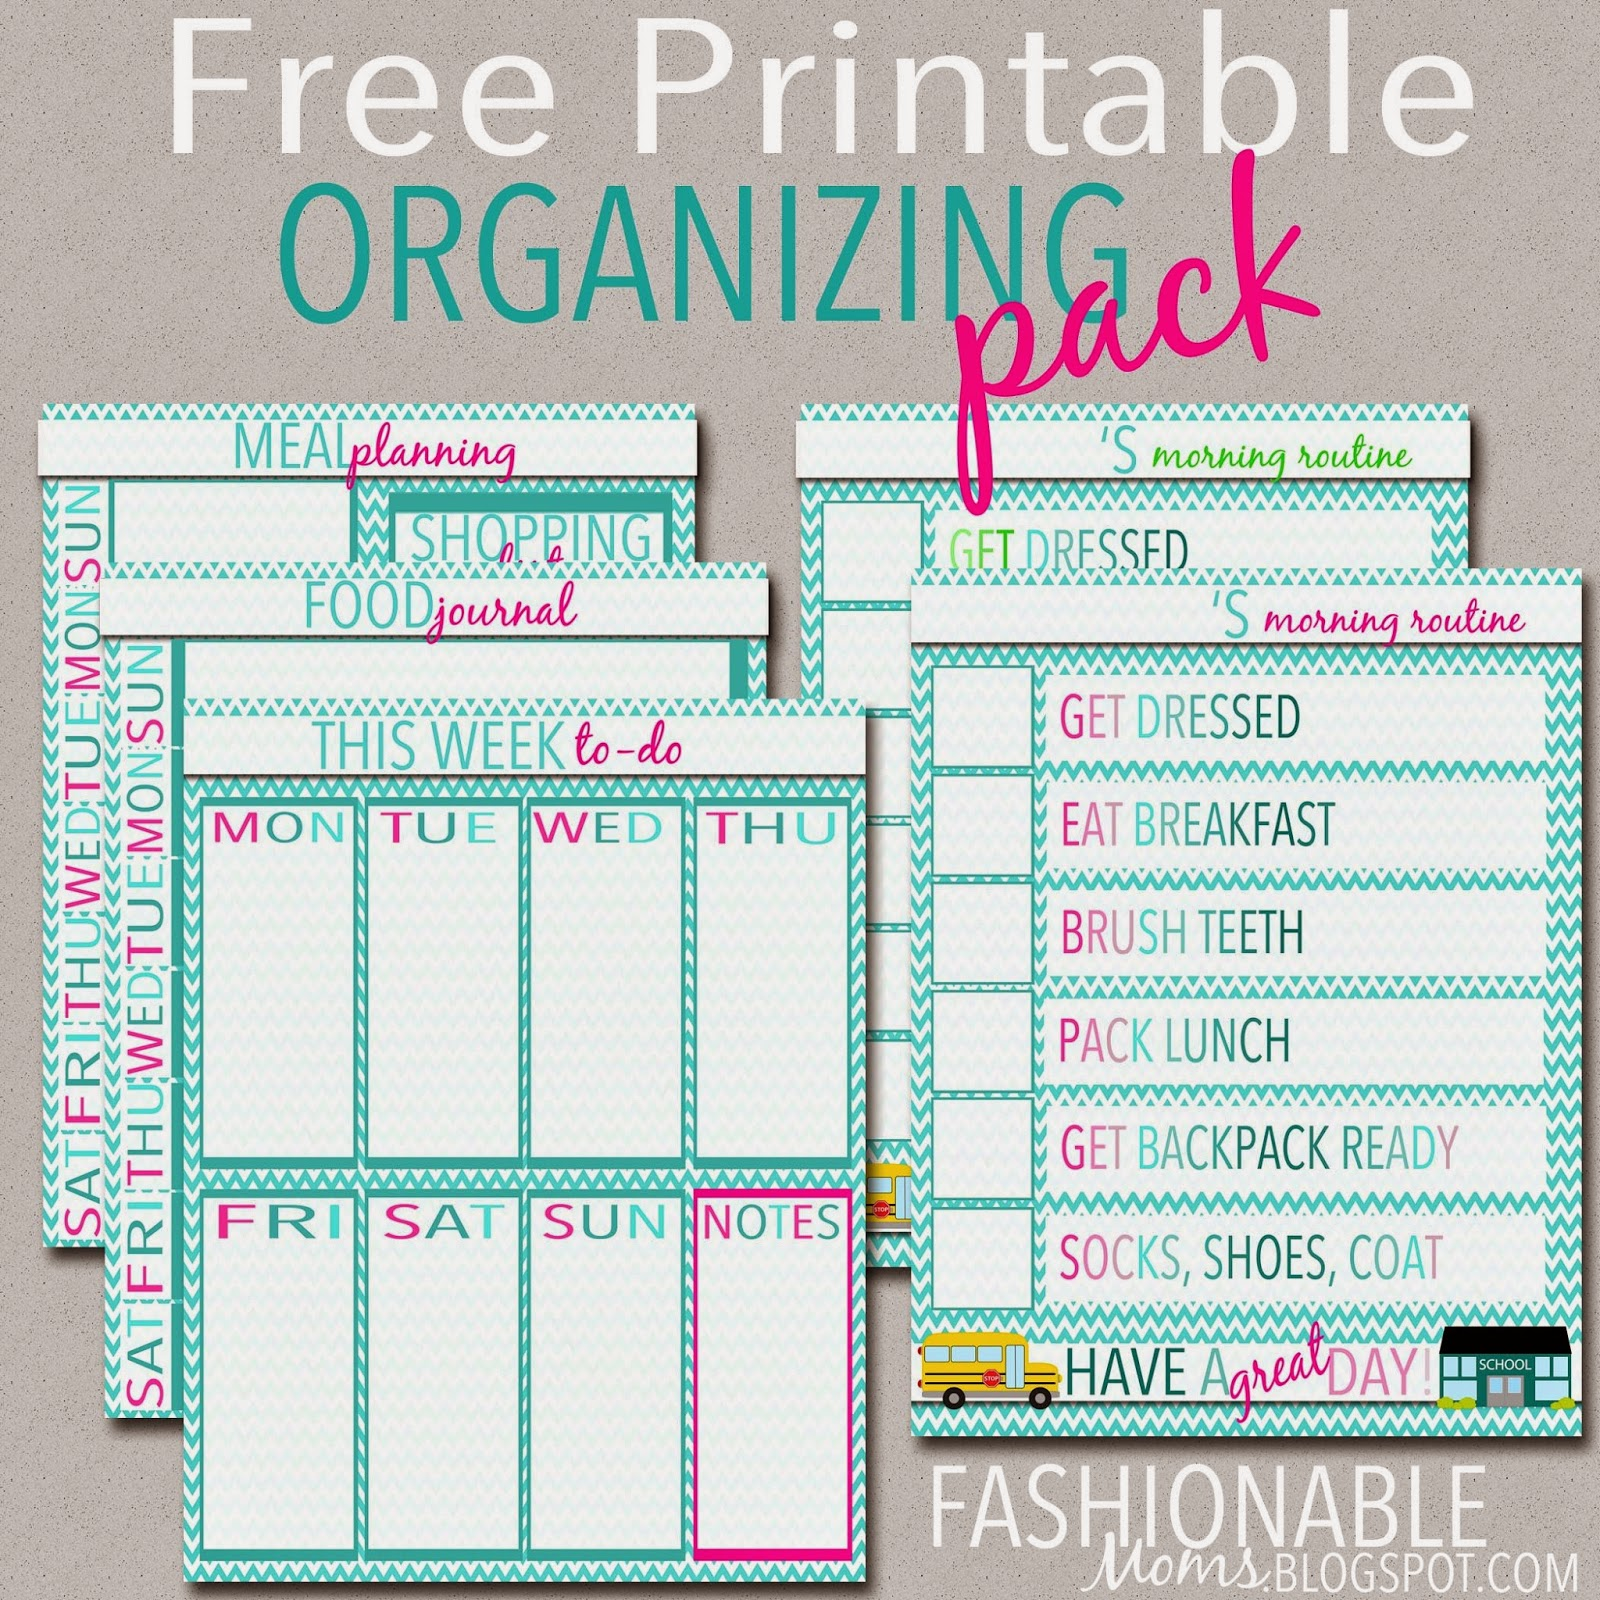 Organization Calendar For Moms : My fashionable designs free printable organizing pack